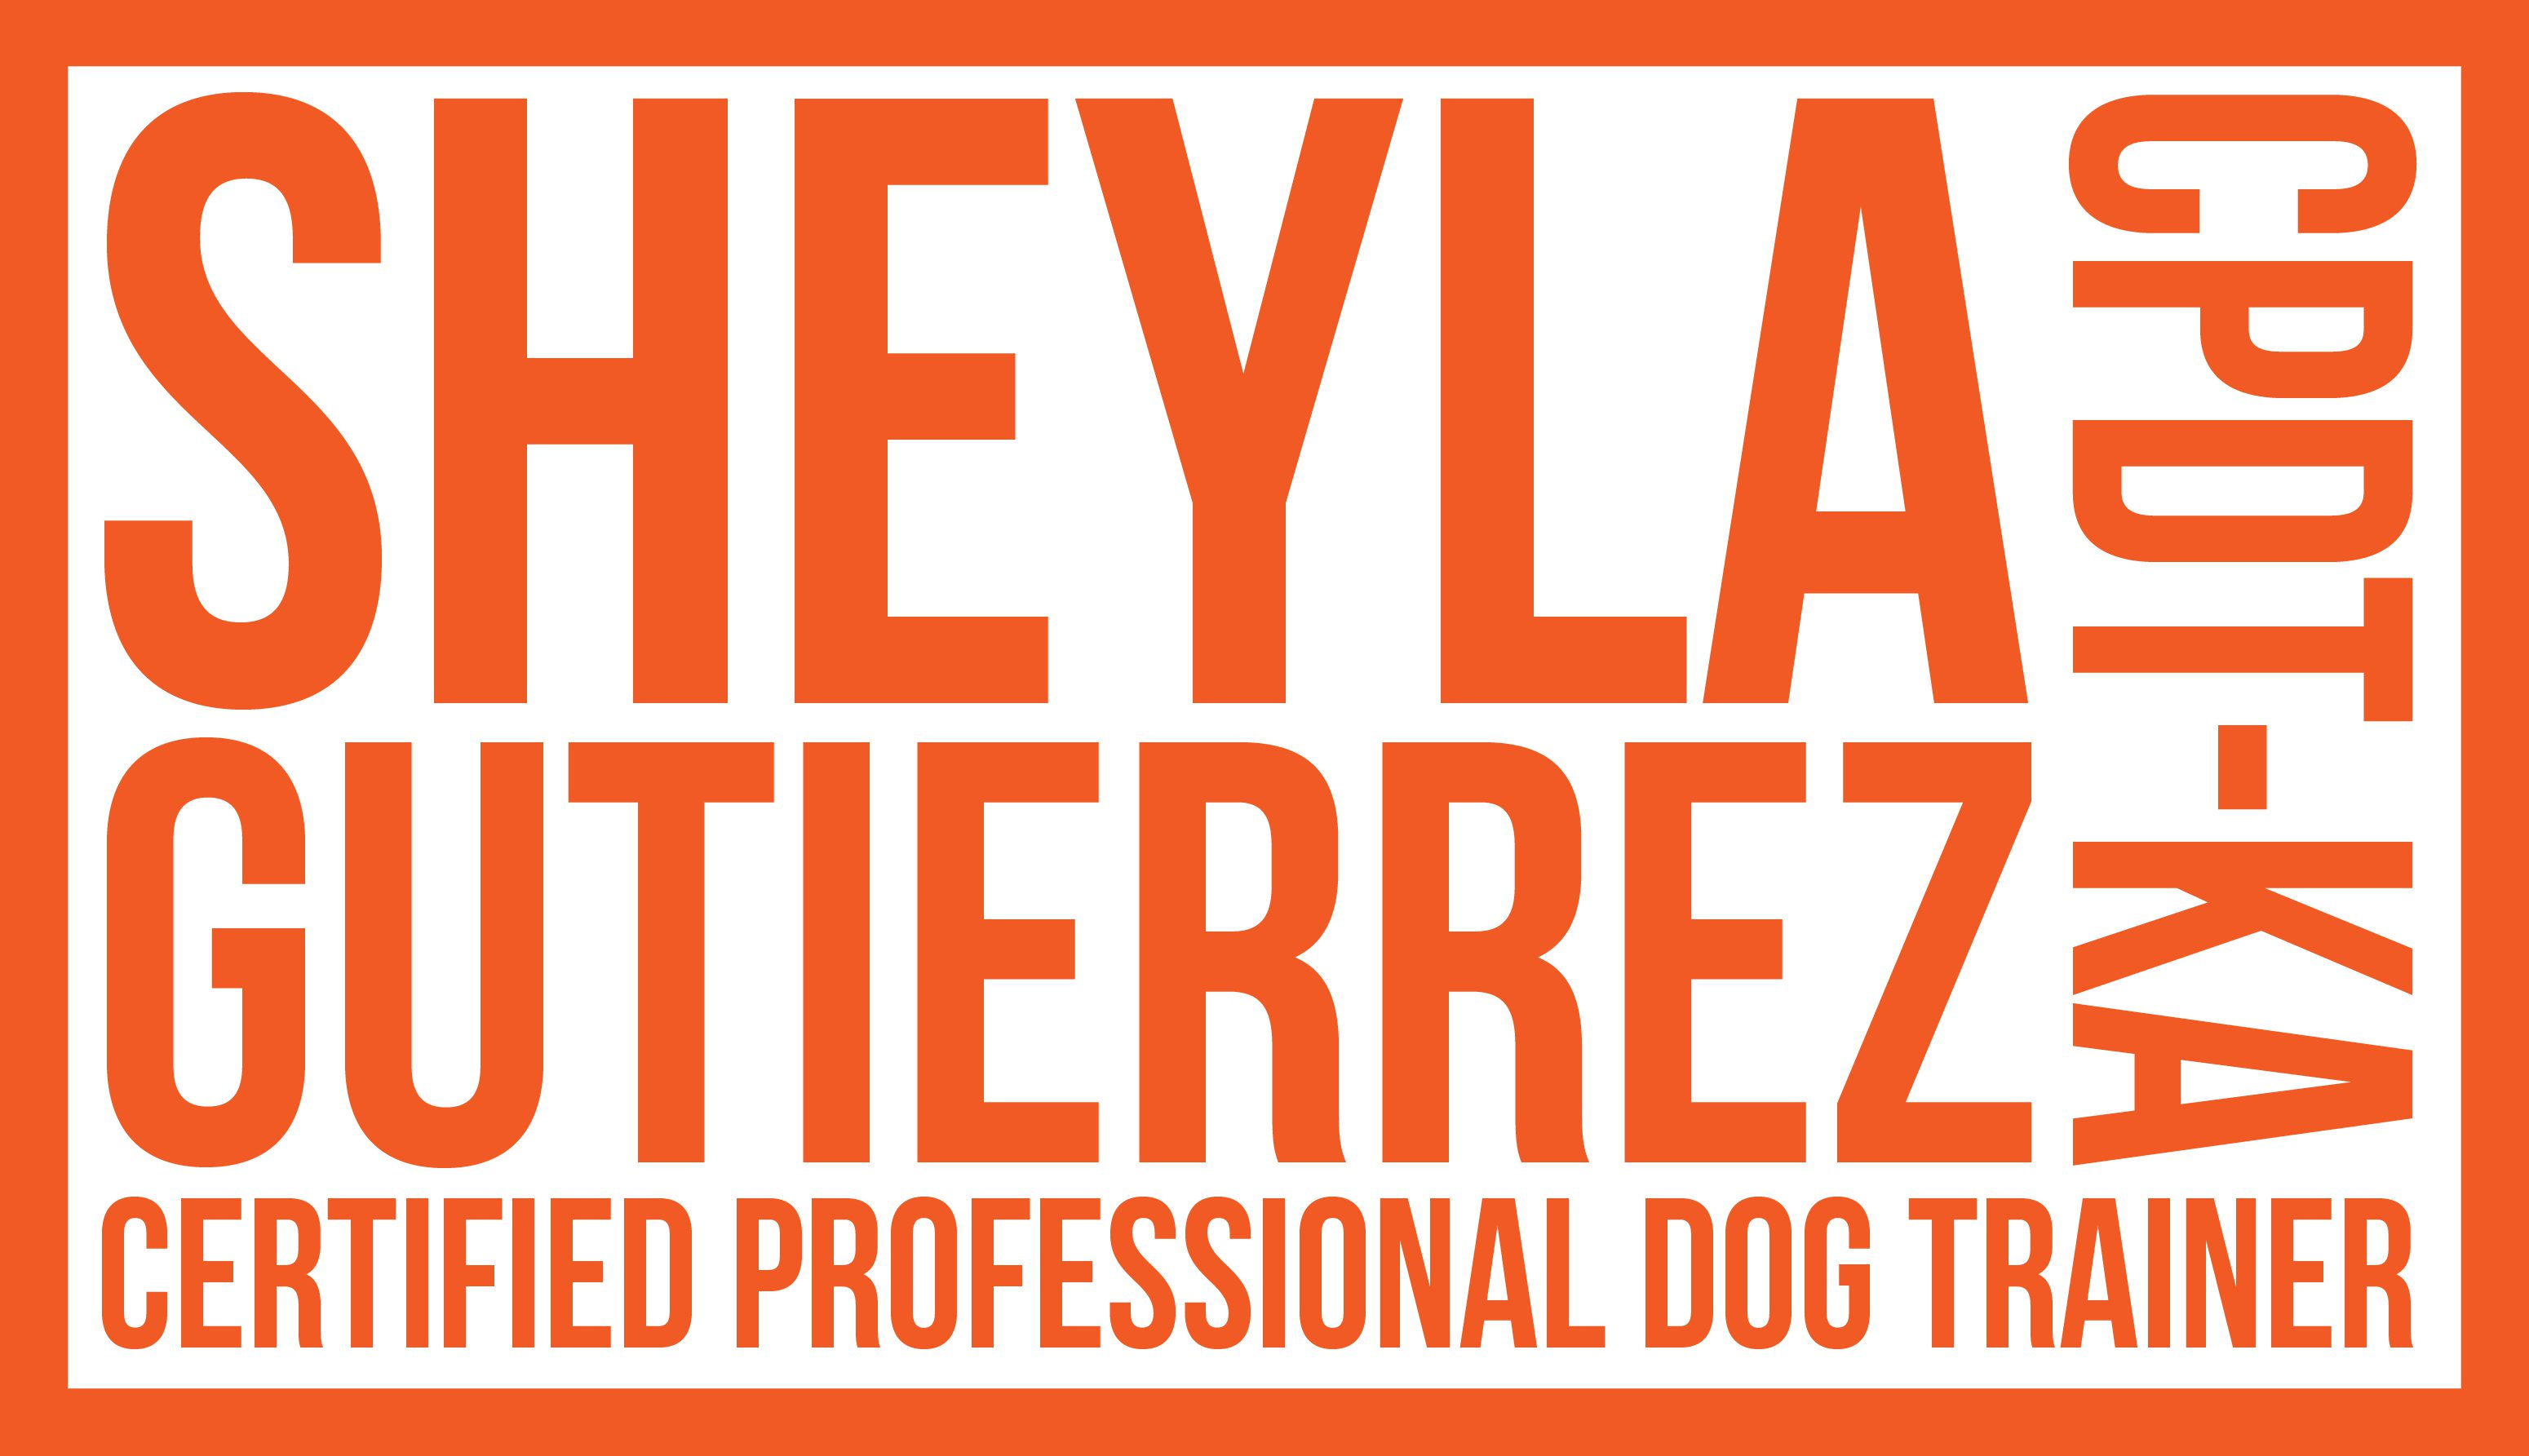 Sheyladogs.com